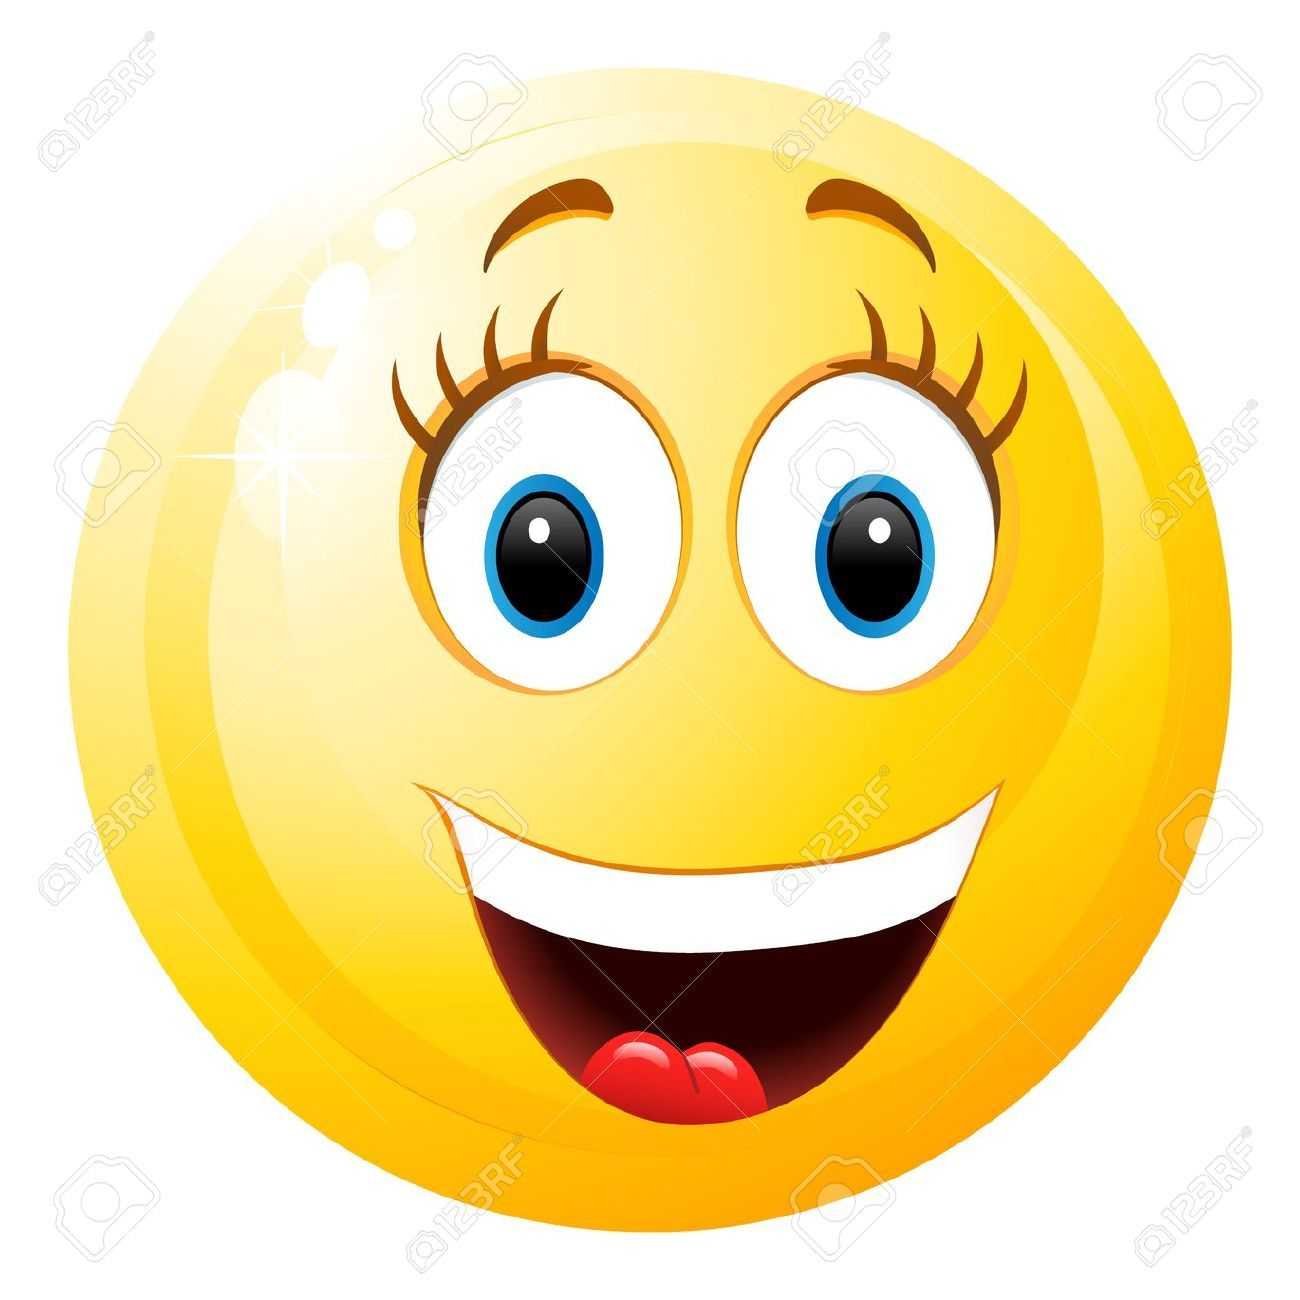 happy face # 8